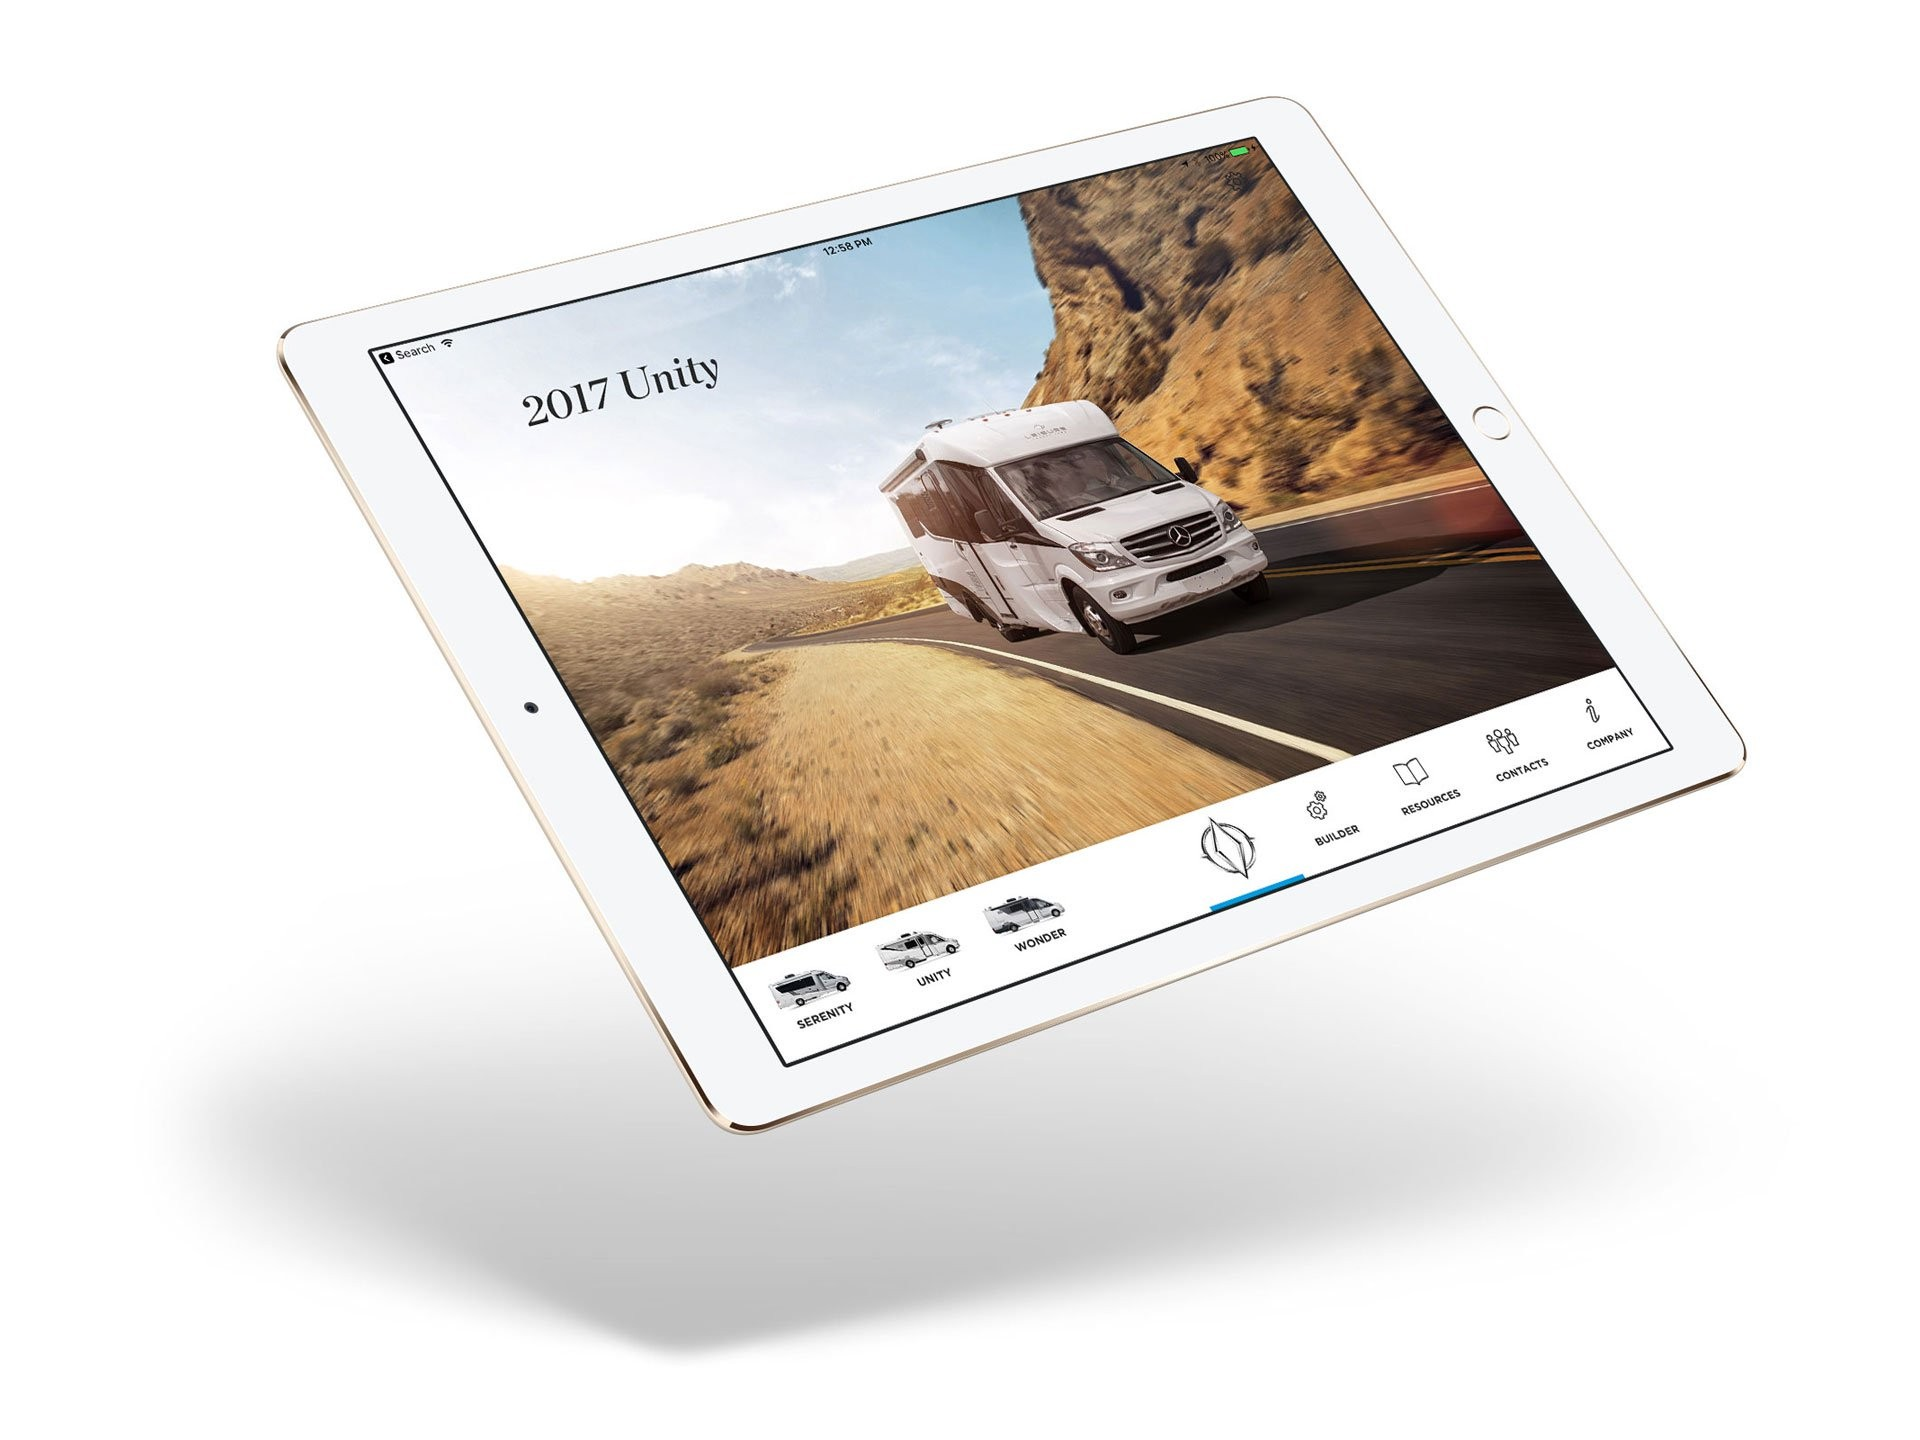 iPad app preview